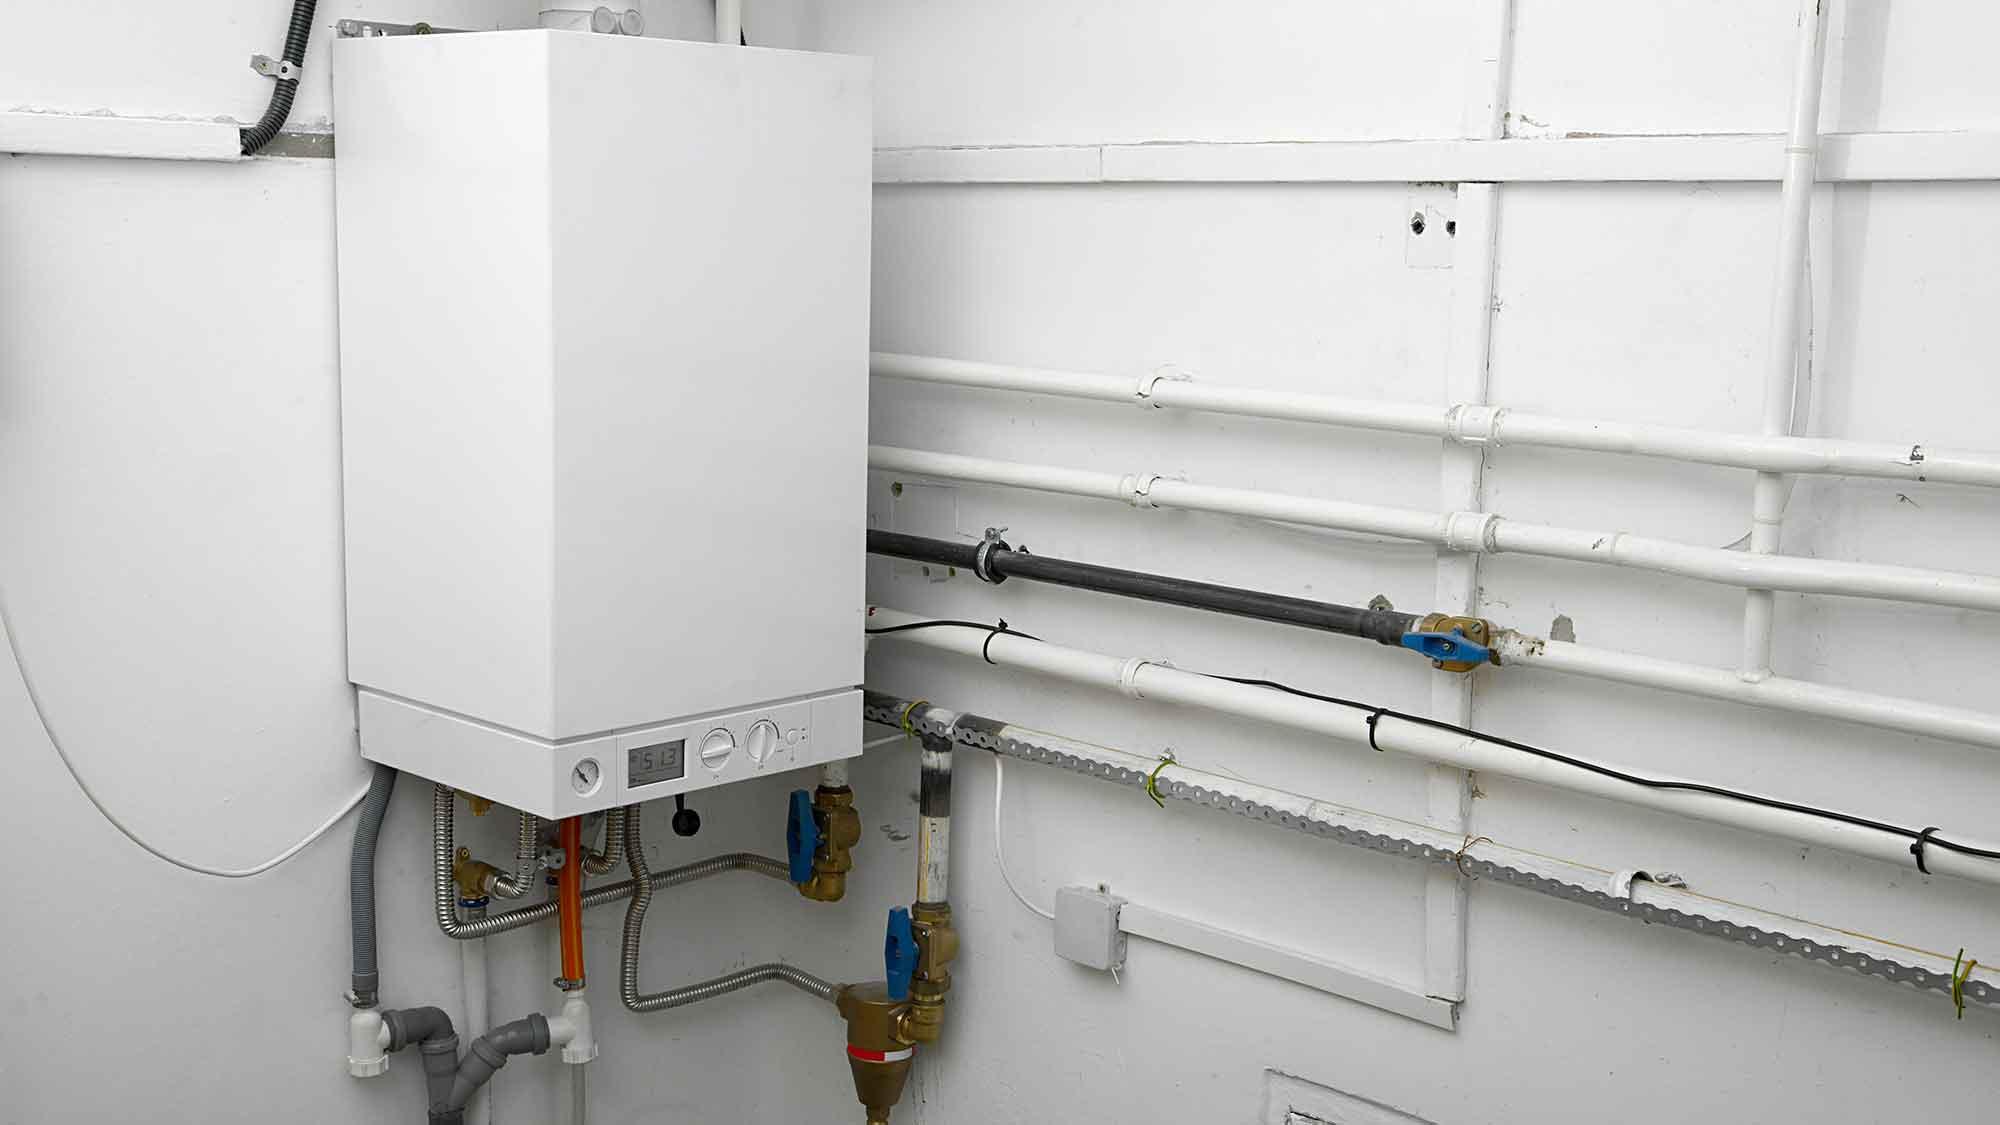 commercial boiler repair essex maintenance leigh on sea room